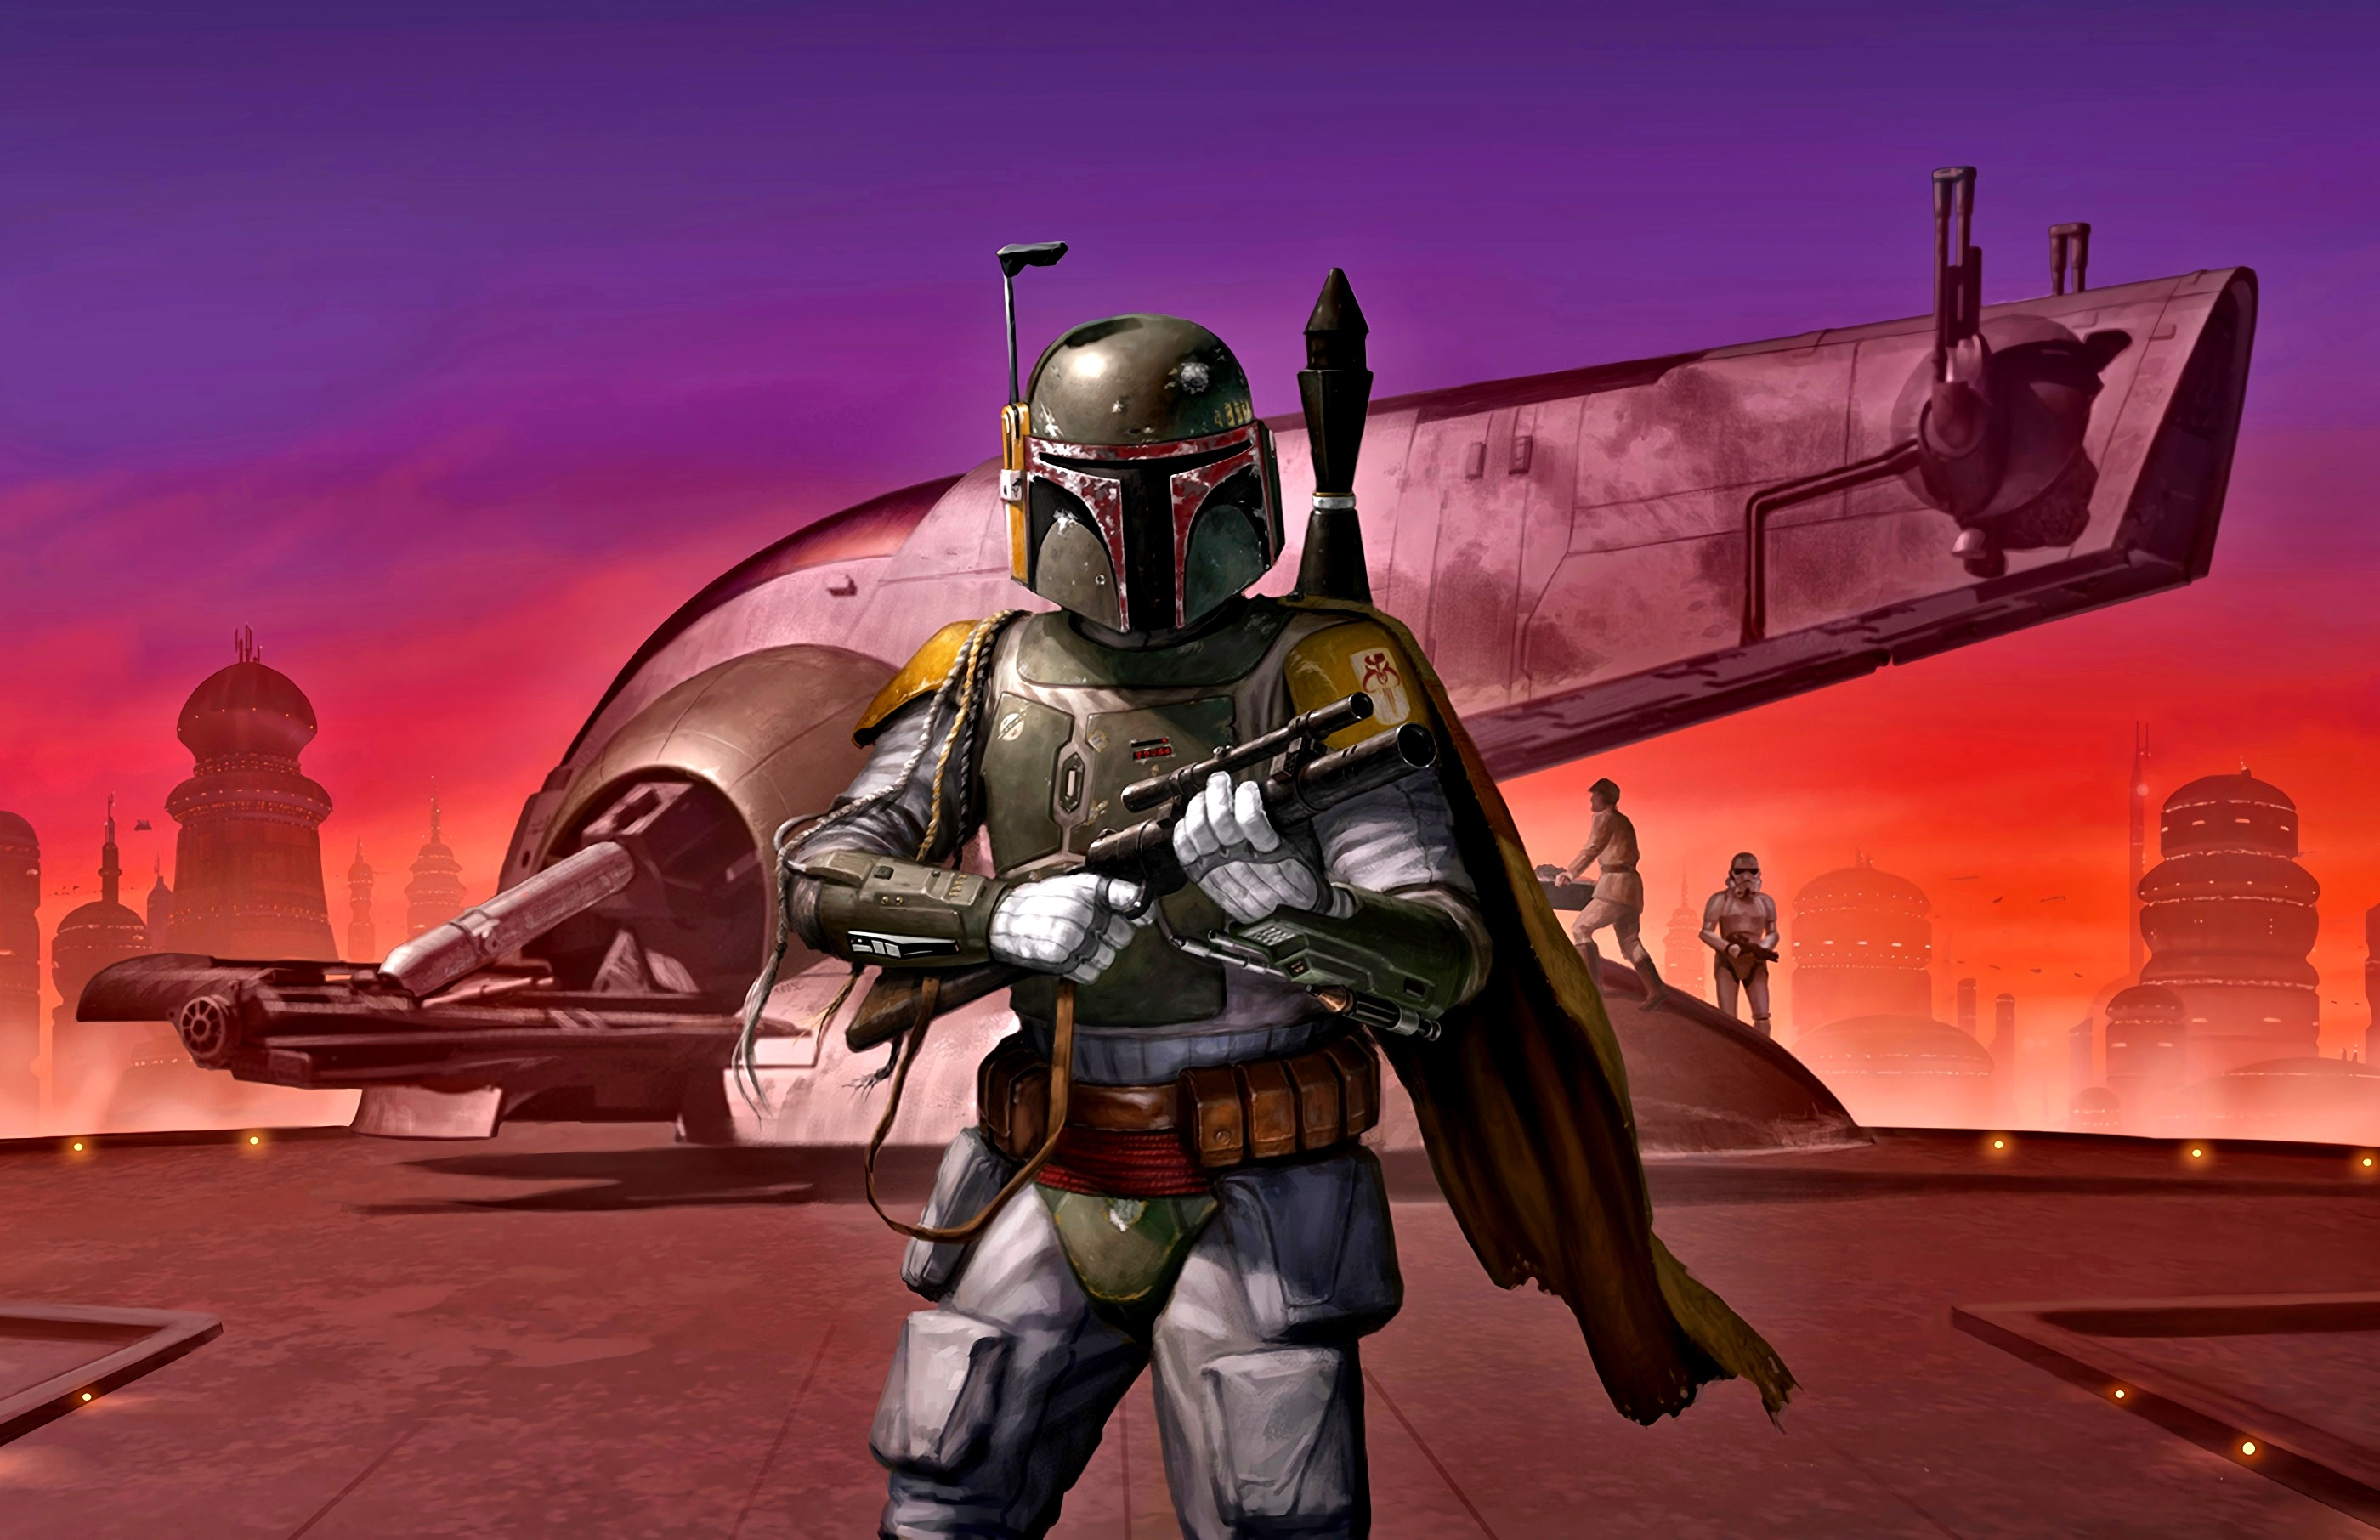 General 2800x1812 Star Wars Boba Fett Bespin spaceship helmet weapon science fiction artwork digital art Slave 1 (Star Wars)